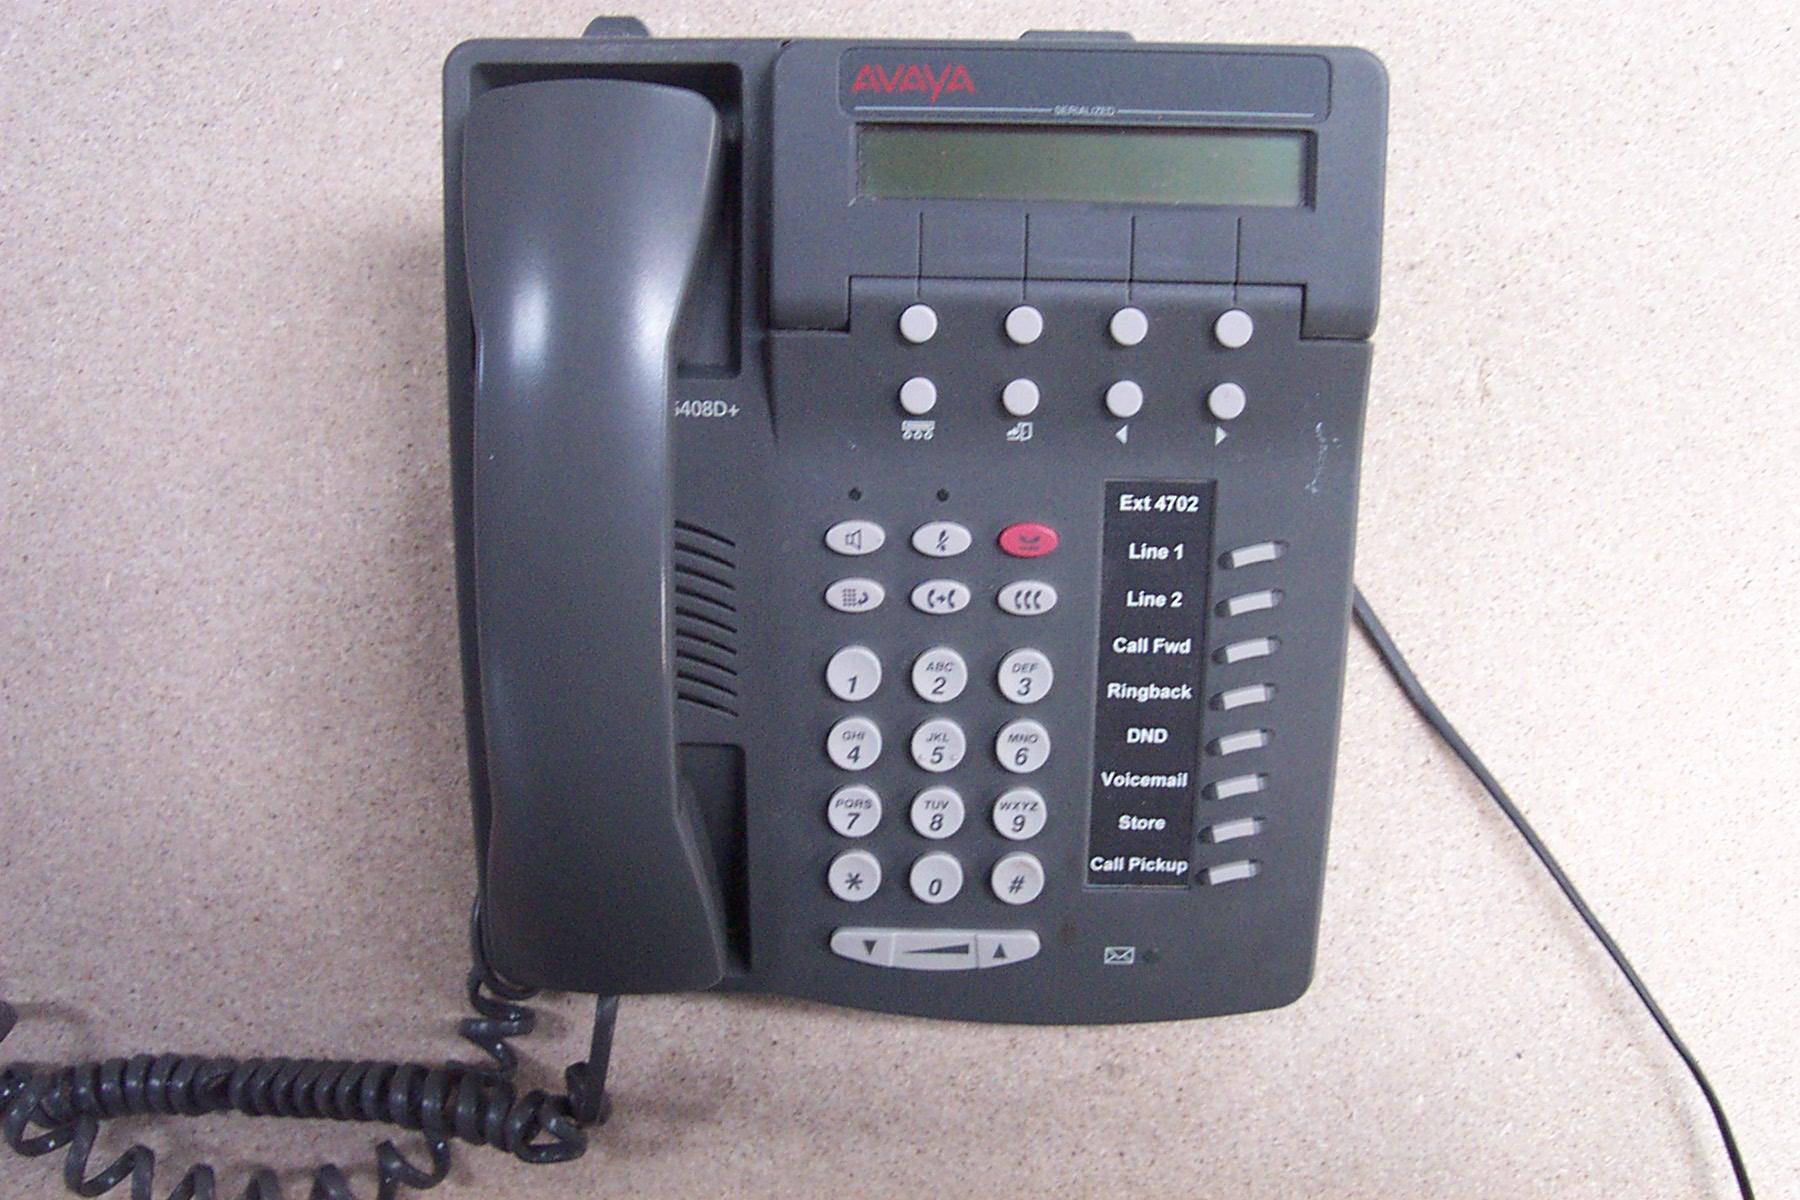 avaya phone 6408d manual daily instruction manual guides u2022 rh testingwordpress co avaya 6408d manual pdf avaya 6408d manual pdf